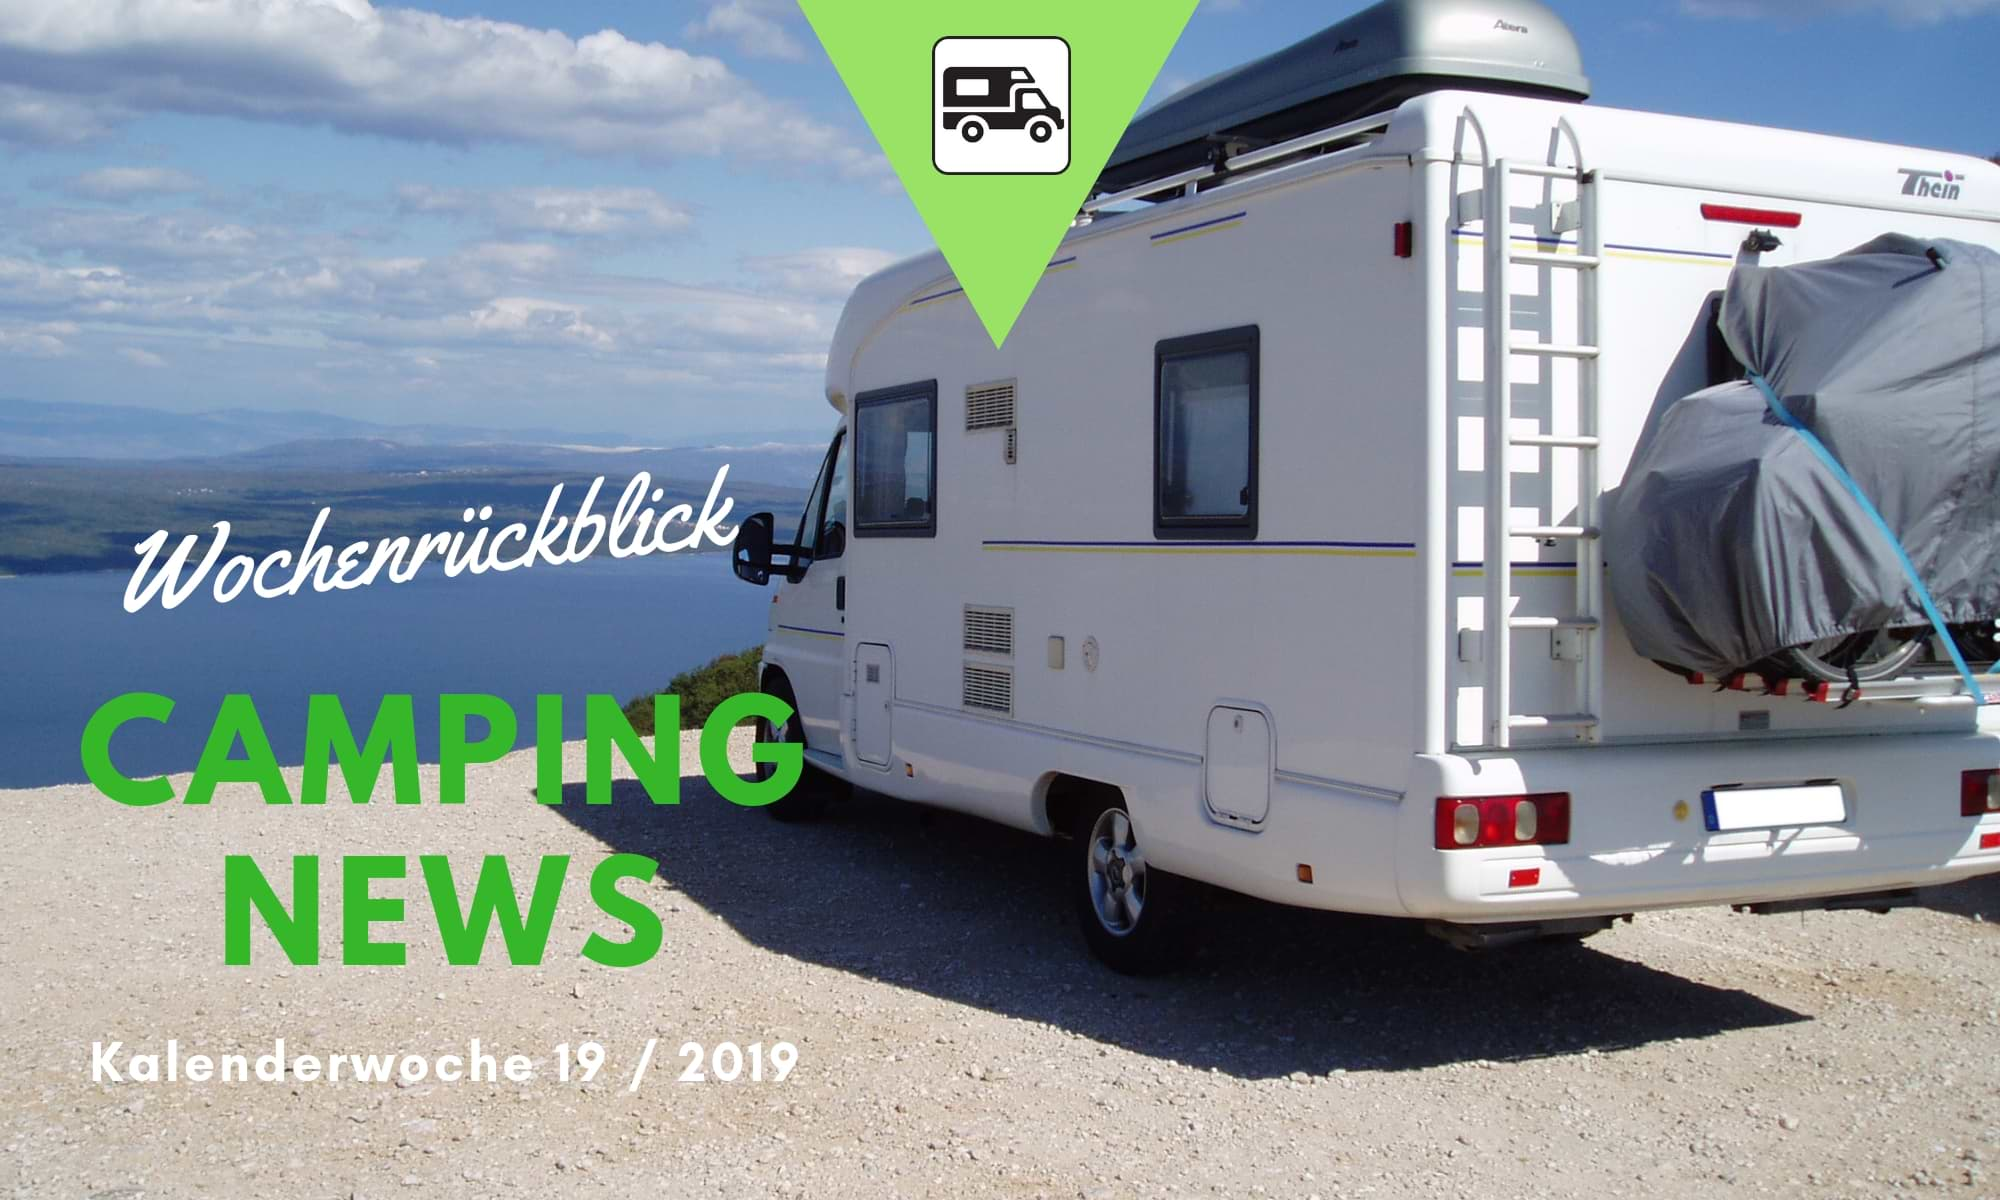 Wochenrückblick Camping News KW19-2019